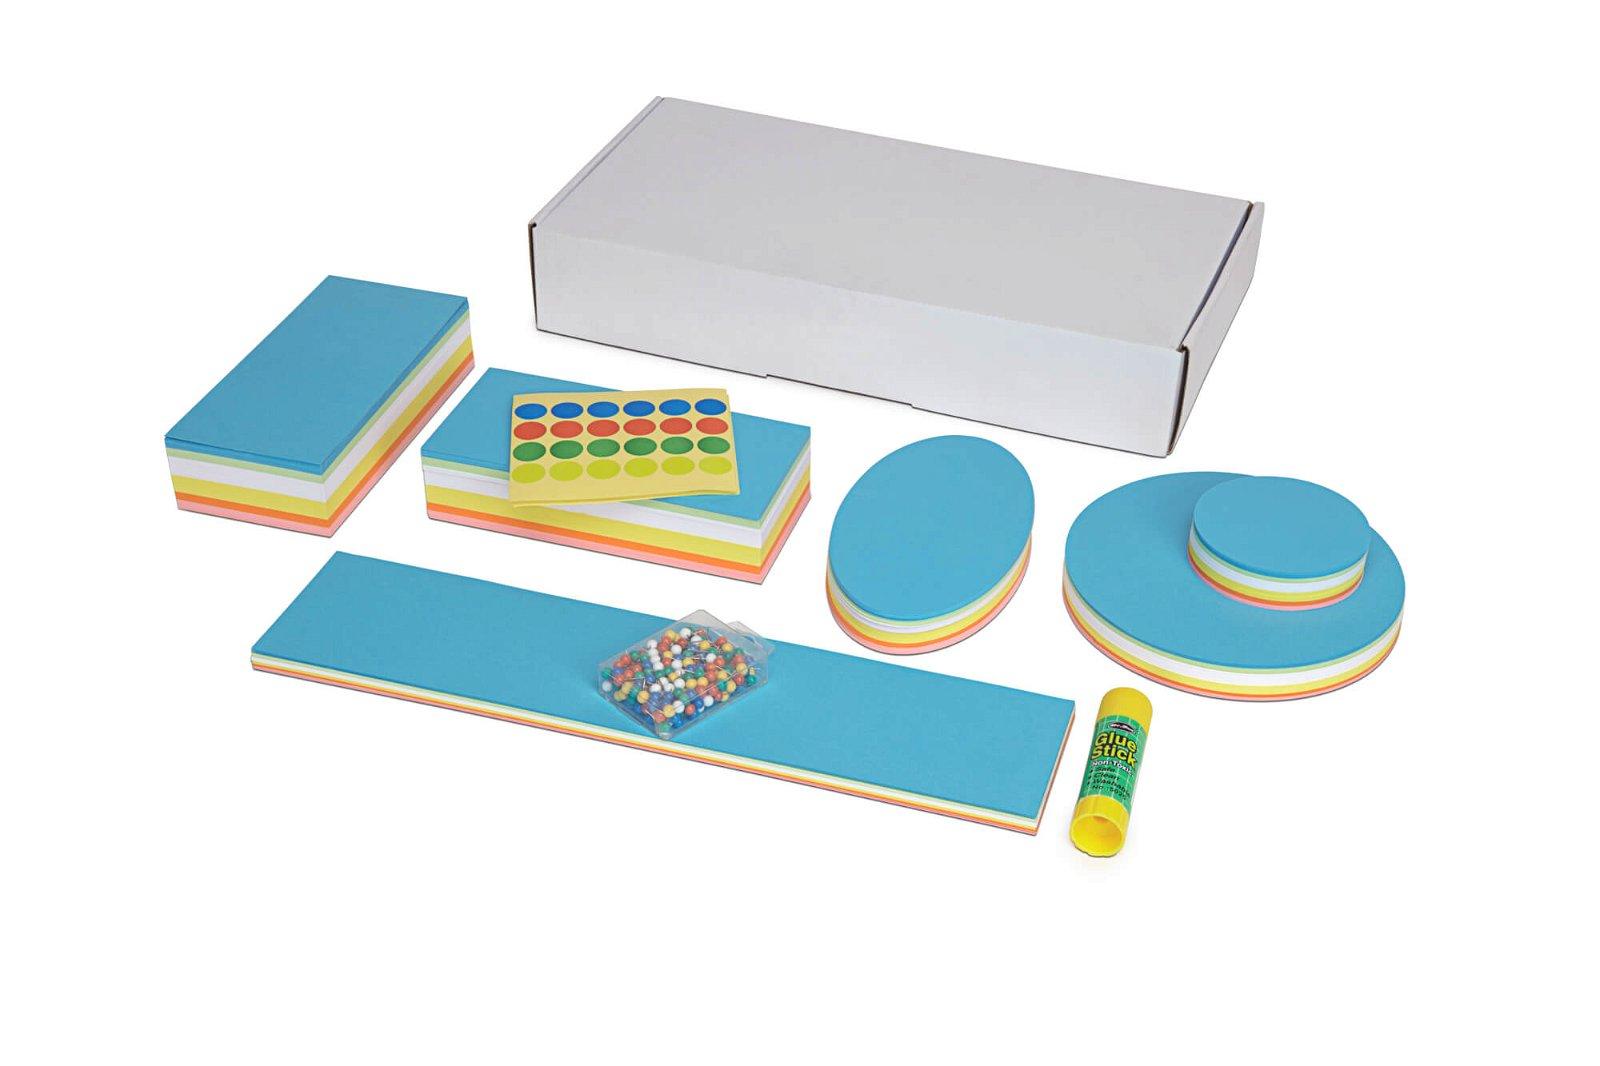 Moderations-Zubehör, Karton, farbig sortiert